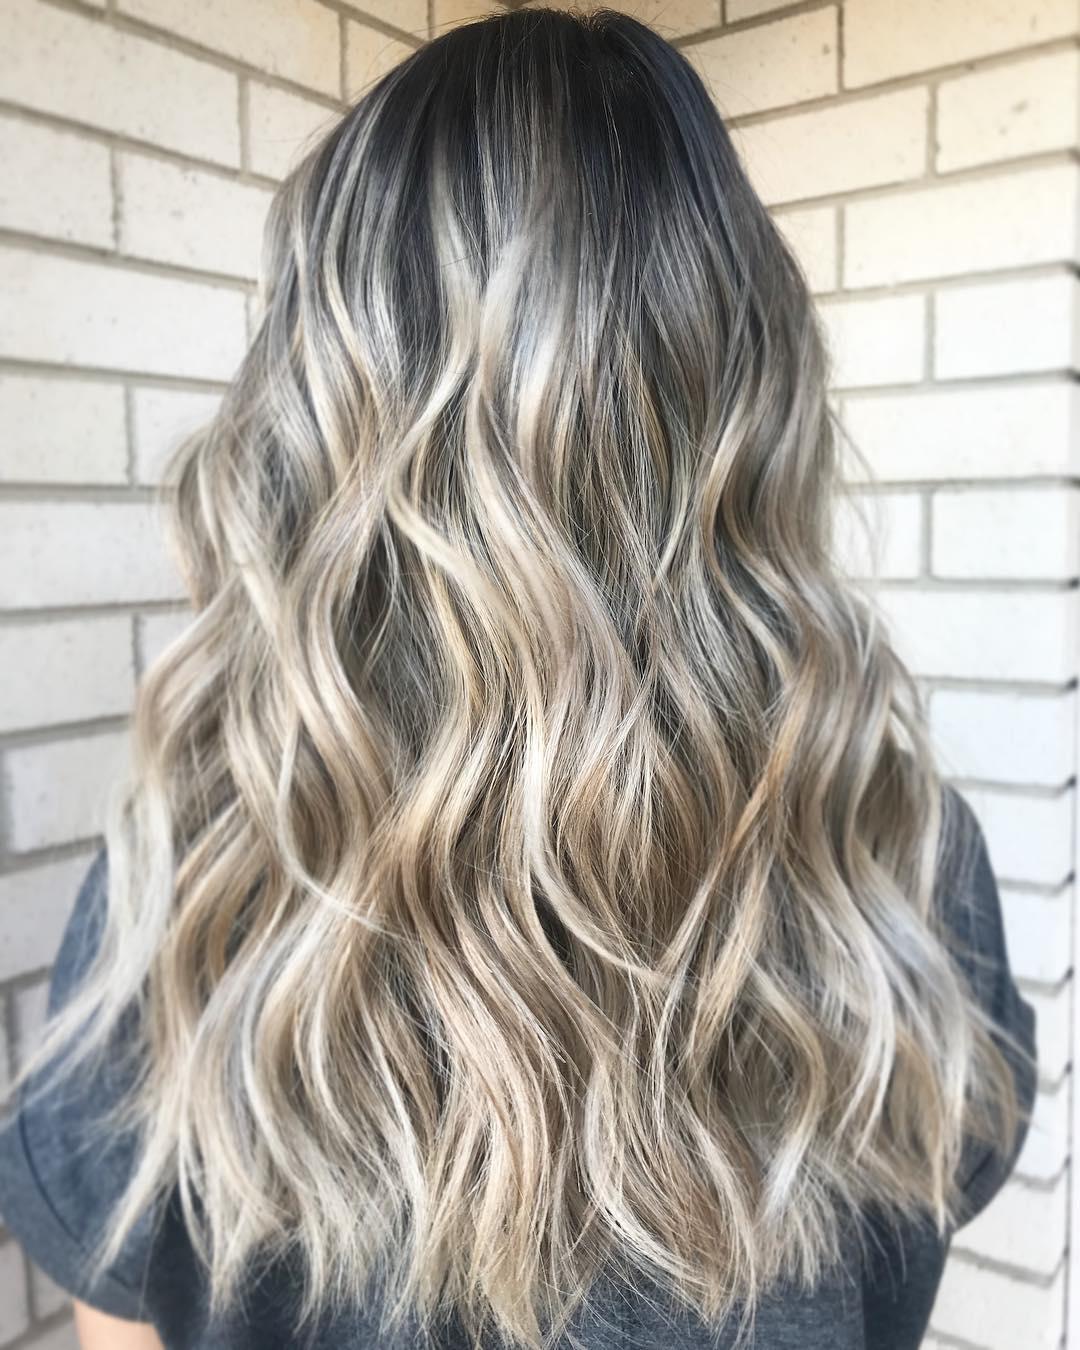 Окрашивание волос зима 2019-2020 фото 5